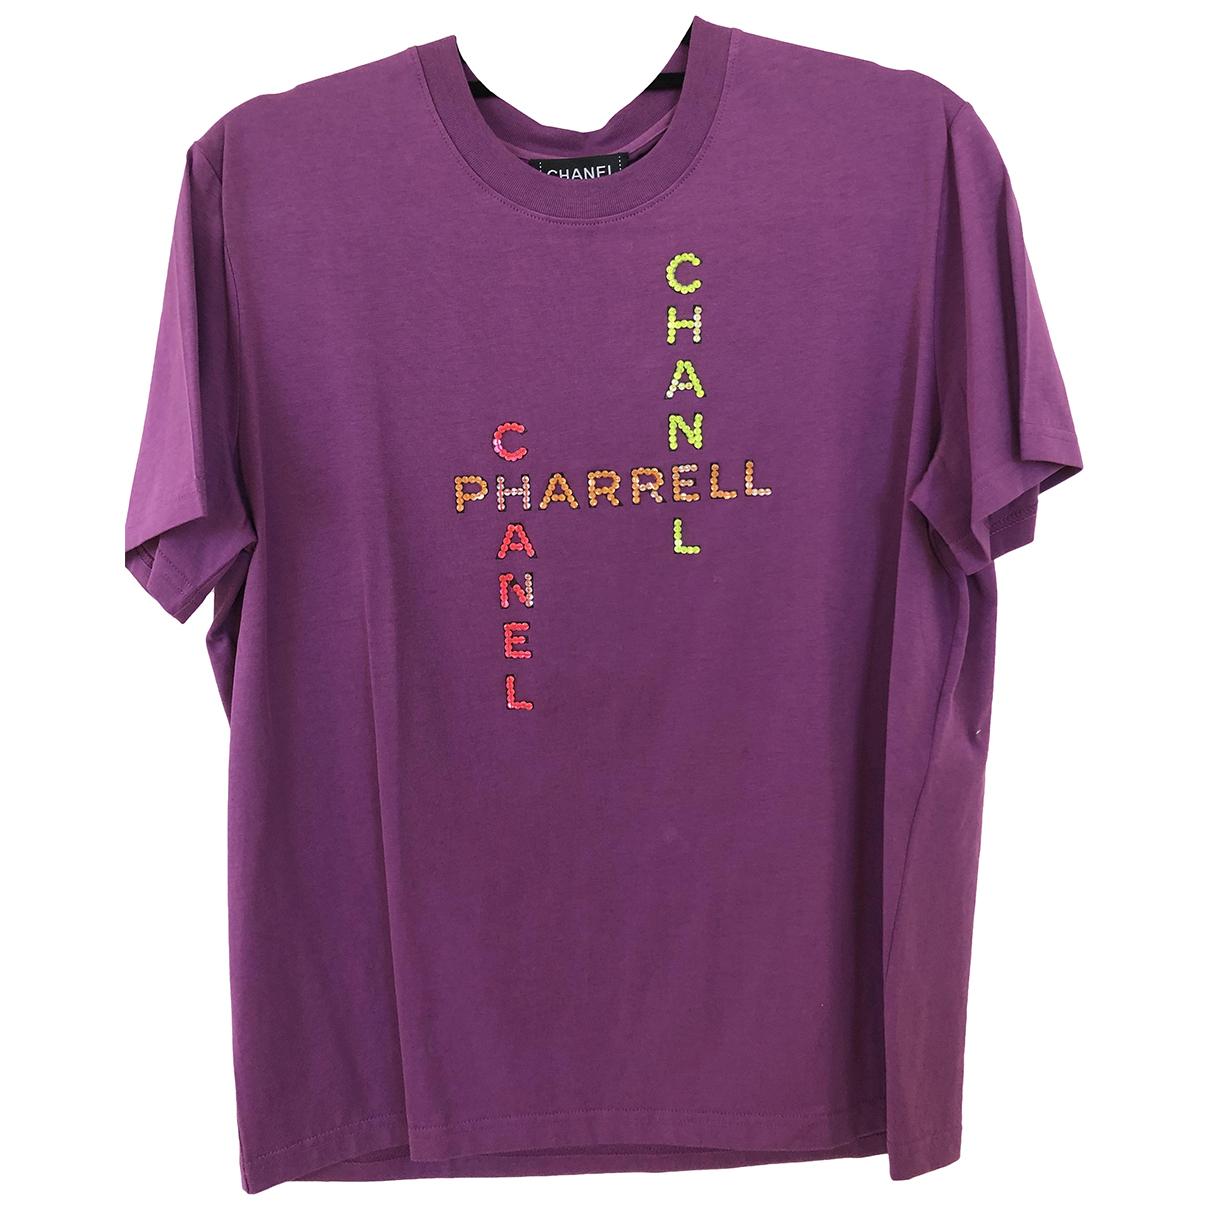 Chanel X Pharrell Williams \N Purple Cotton T-shirts for Men M International